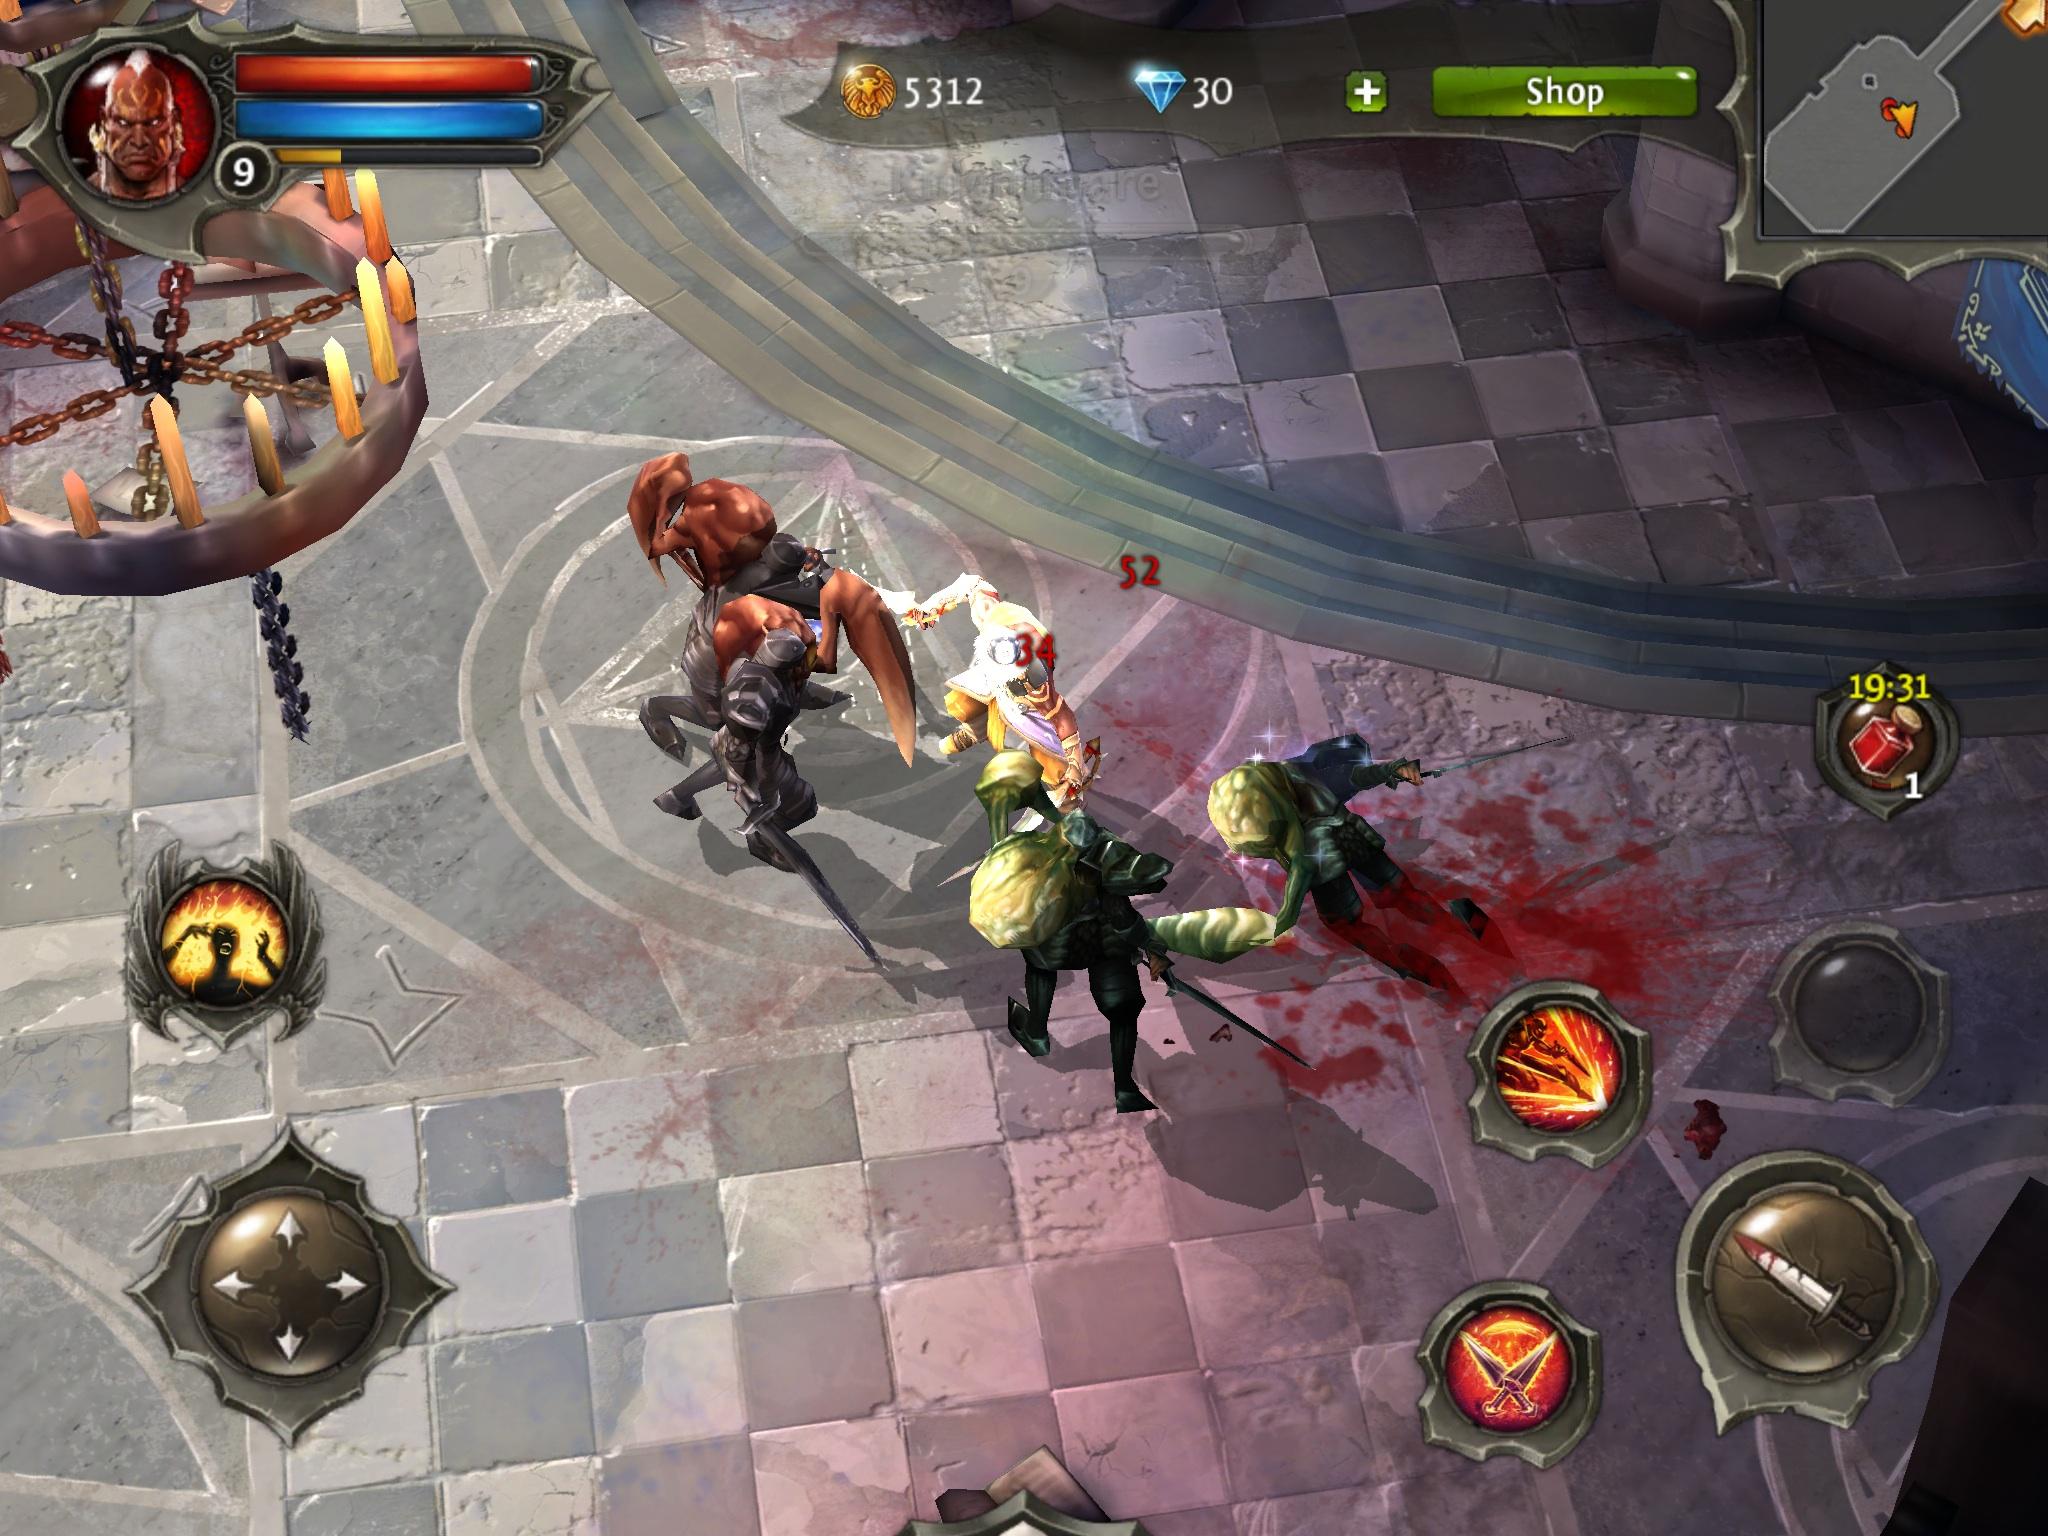 скачать на андроид dungeon hunter